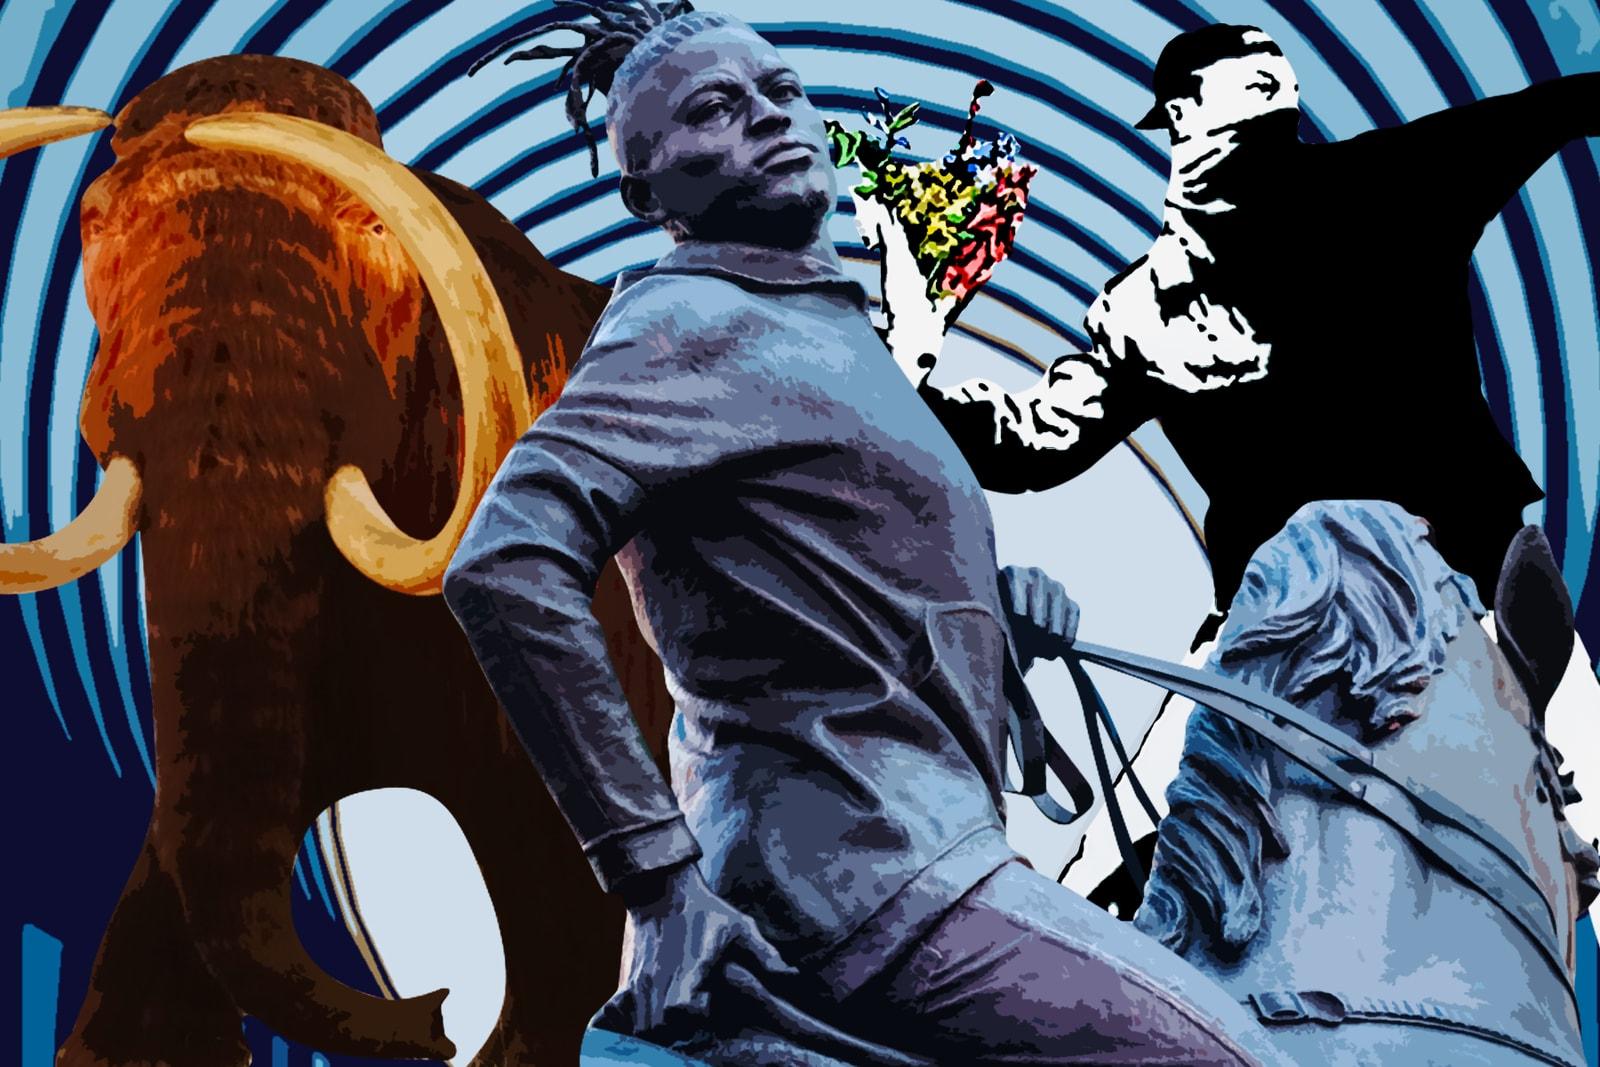 kehinde wiley rumors of war kaws ai weiwei chairman mao volkswagon notre dame cathedral louvre musee museum vitruvian man leonardo davinci klaus littman maurizio cattelan kanye west james turrell jesus is king